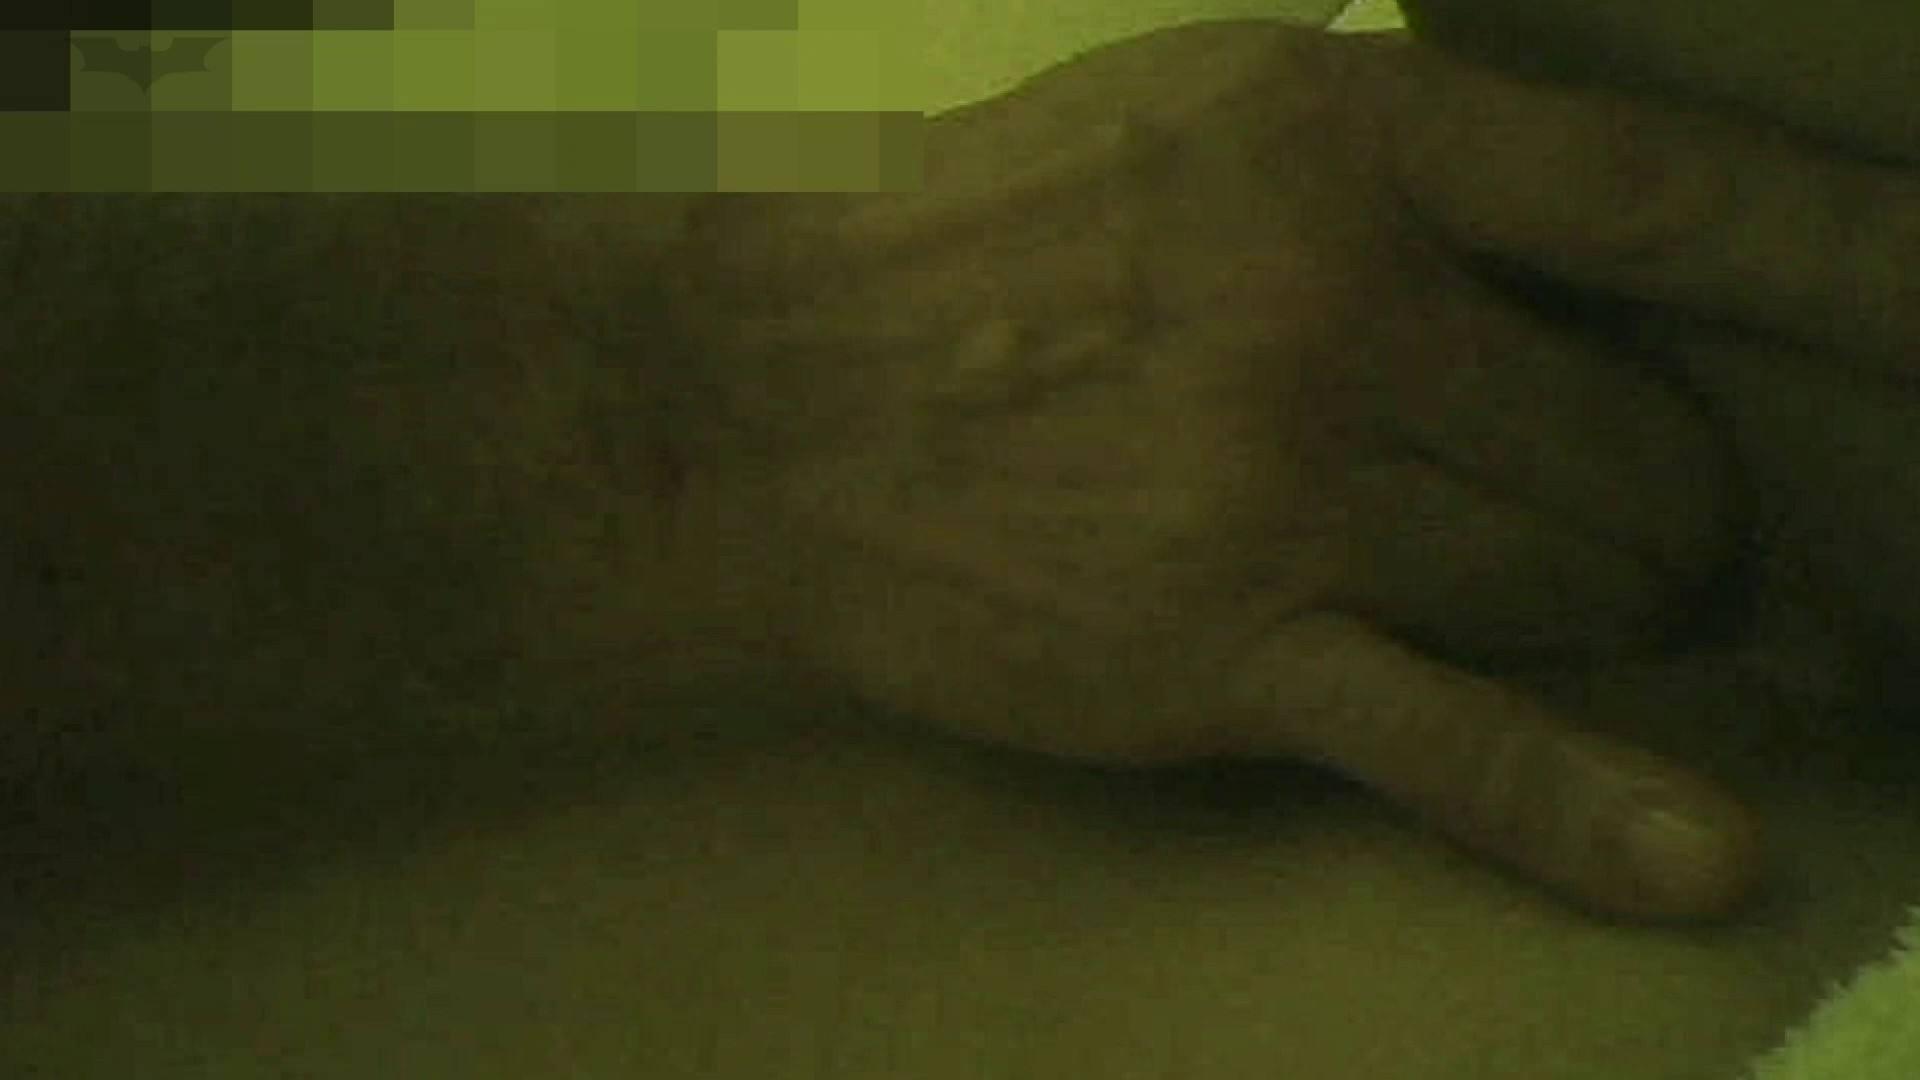 Part2 合コンで知り合った ありさちゃん Vol.02 マンコ丸見え編 丸見え われめAV動画紹介 79連発 68